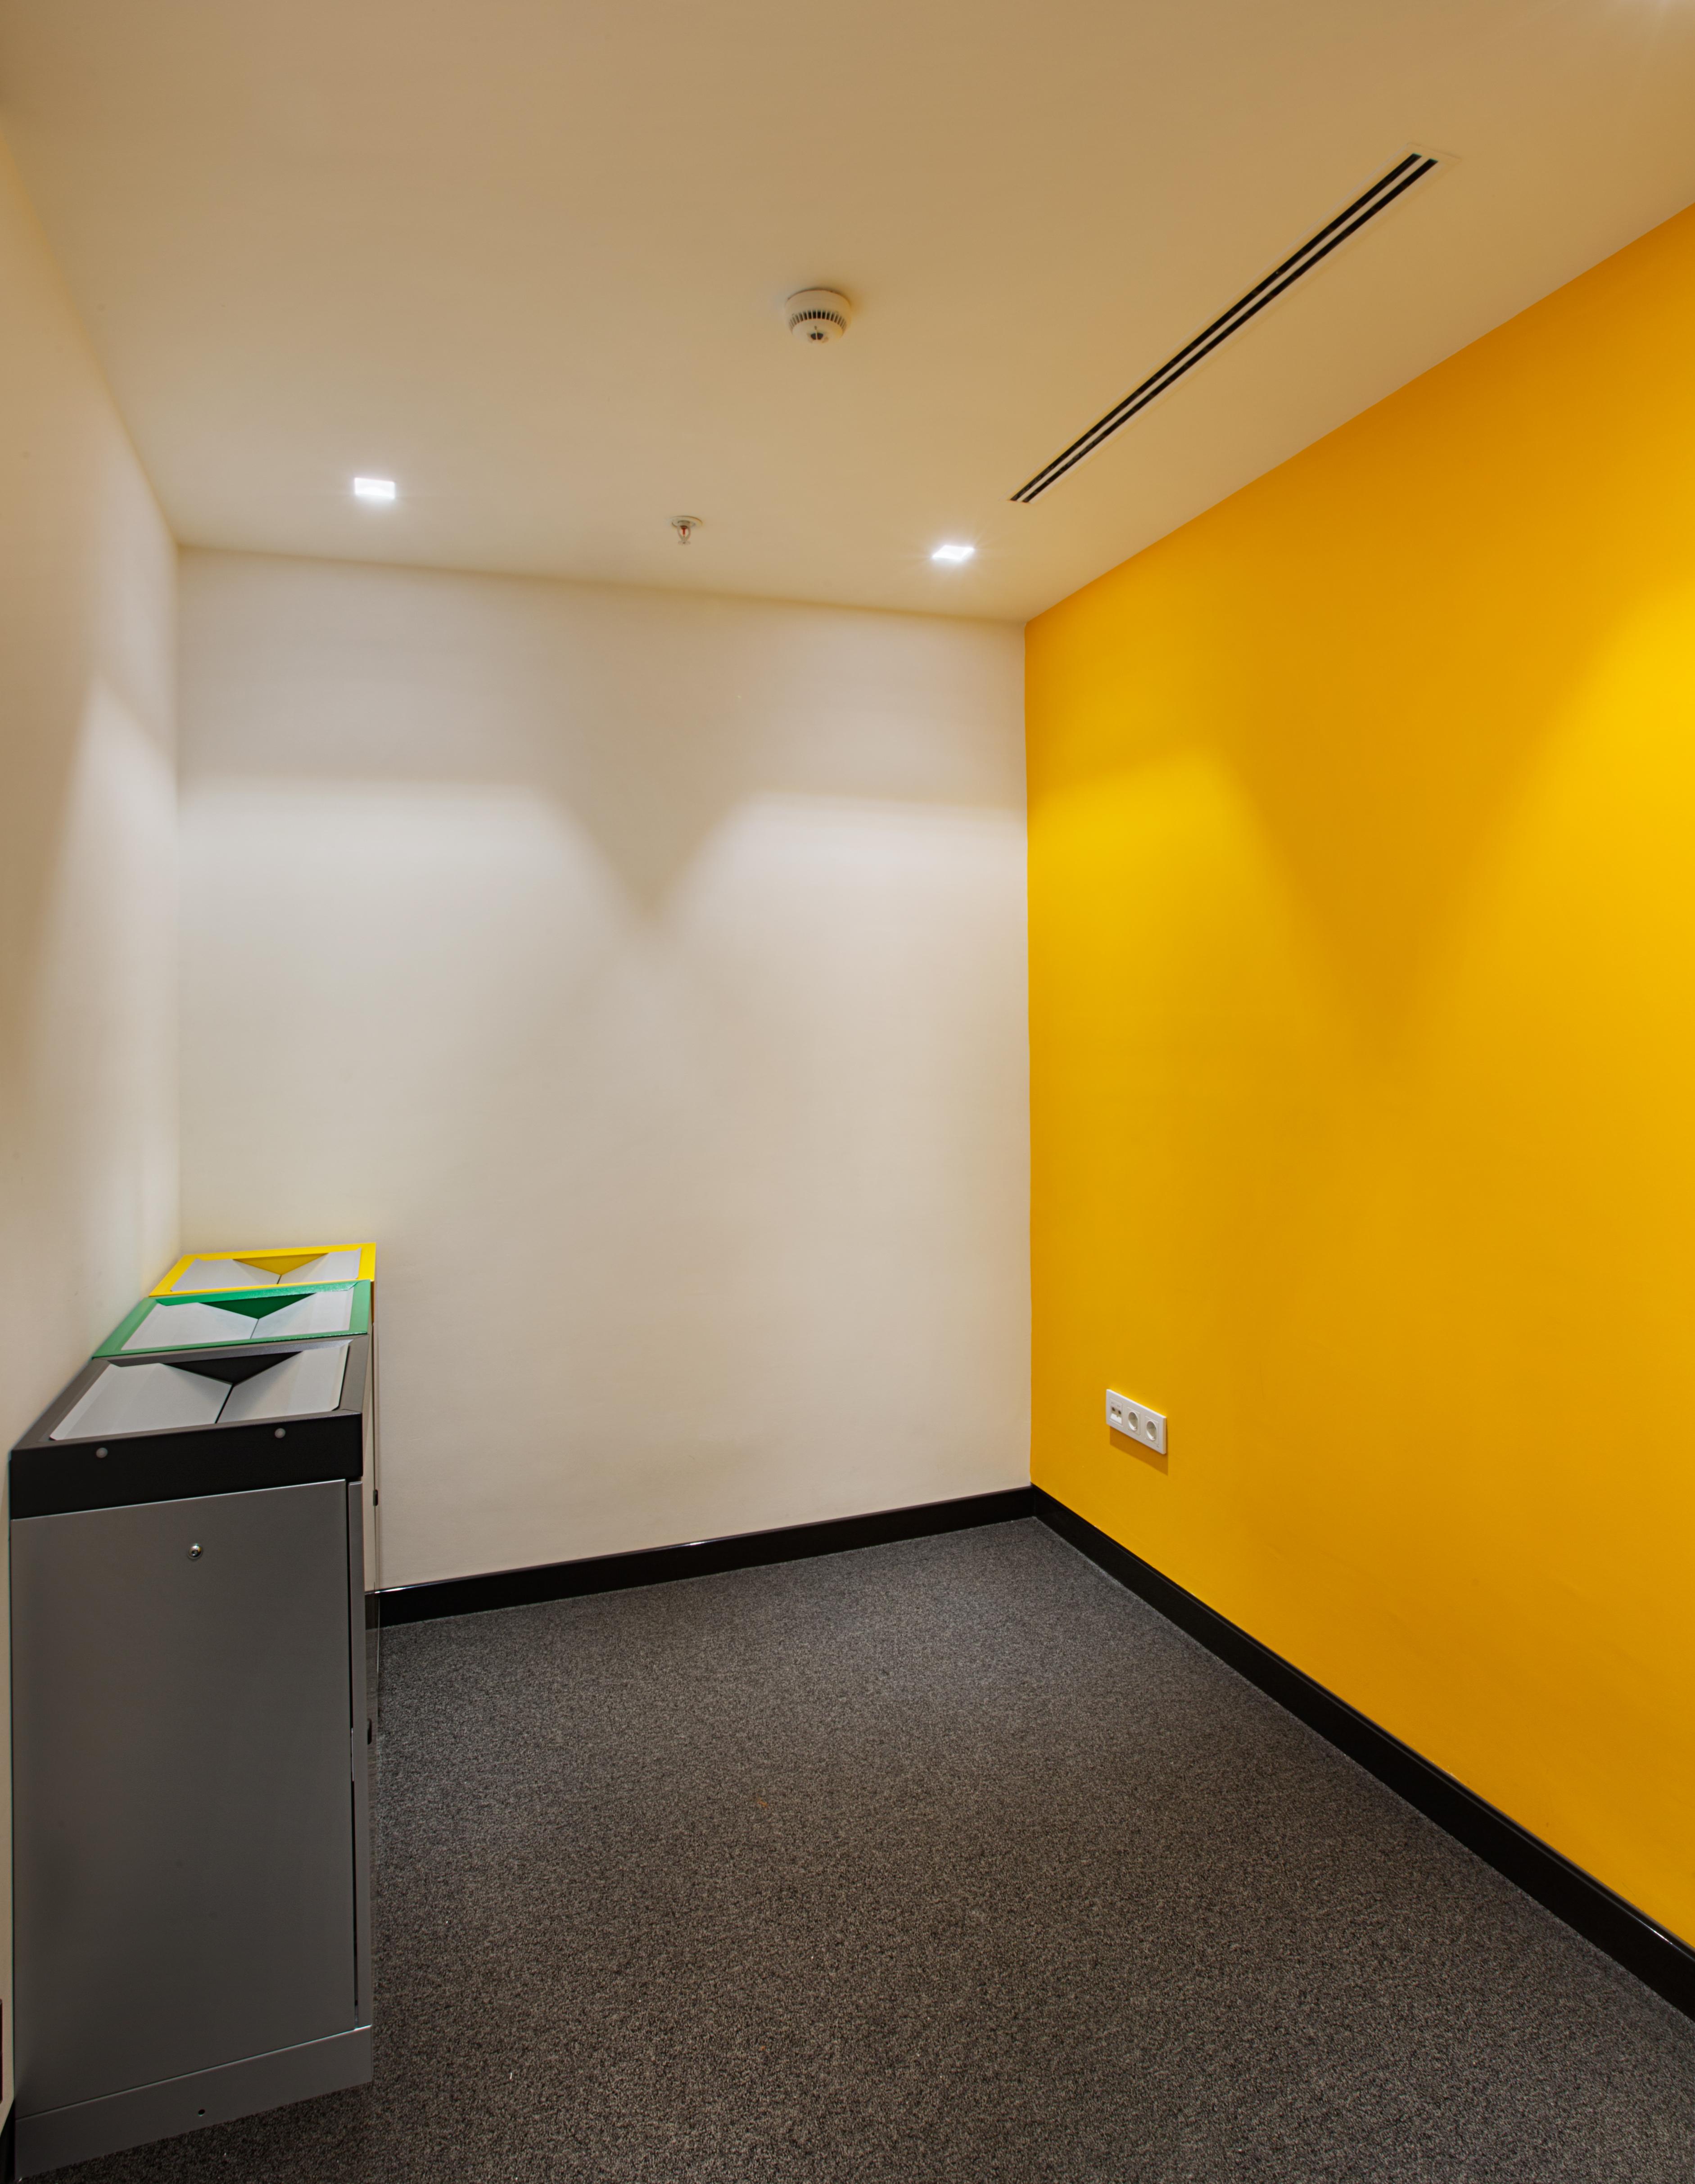 Avci+Architects-+INC+Research+Istanbul+Merkez+Ofisi-9